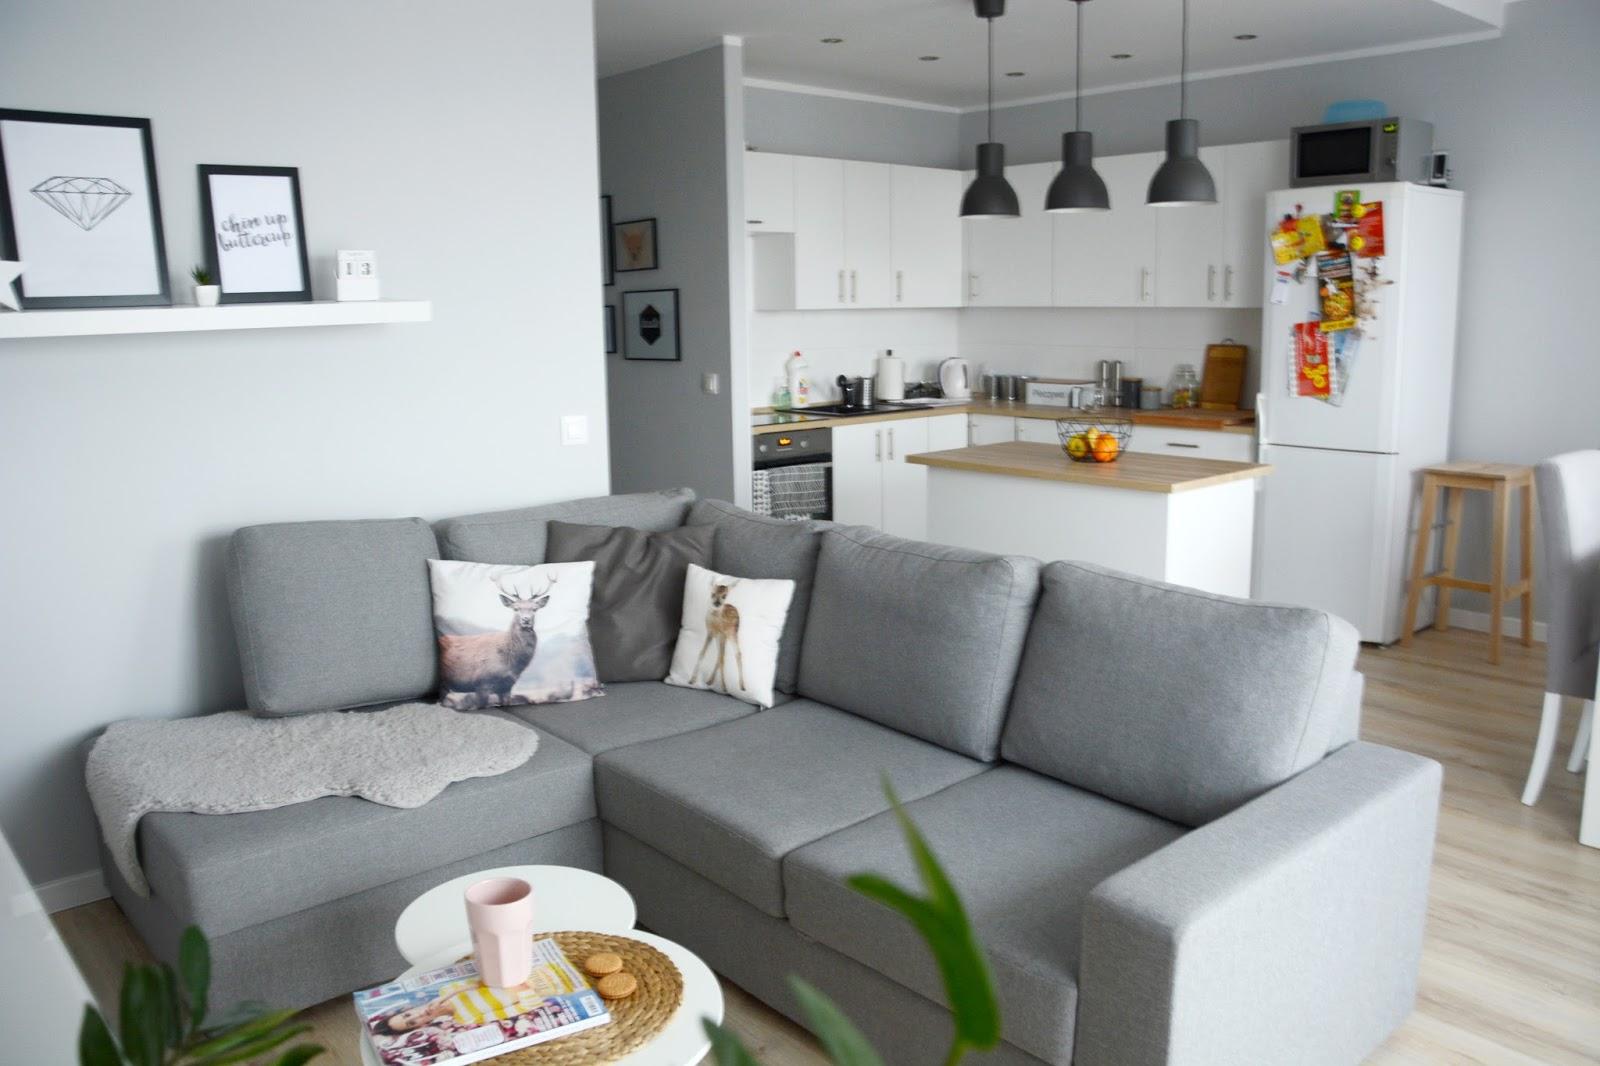 Projekt Tanie Mieszkanie Salon Kuchnia I Przedpokoj Na Biurku Oli